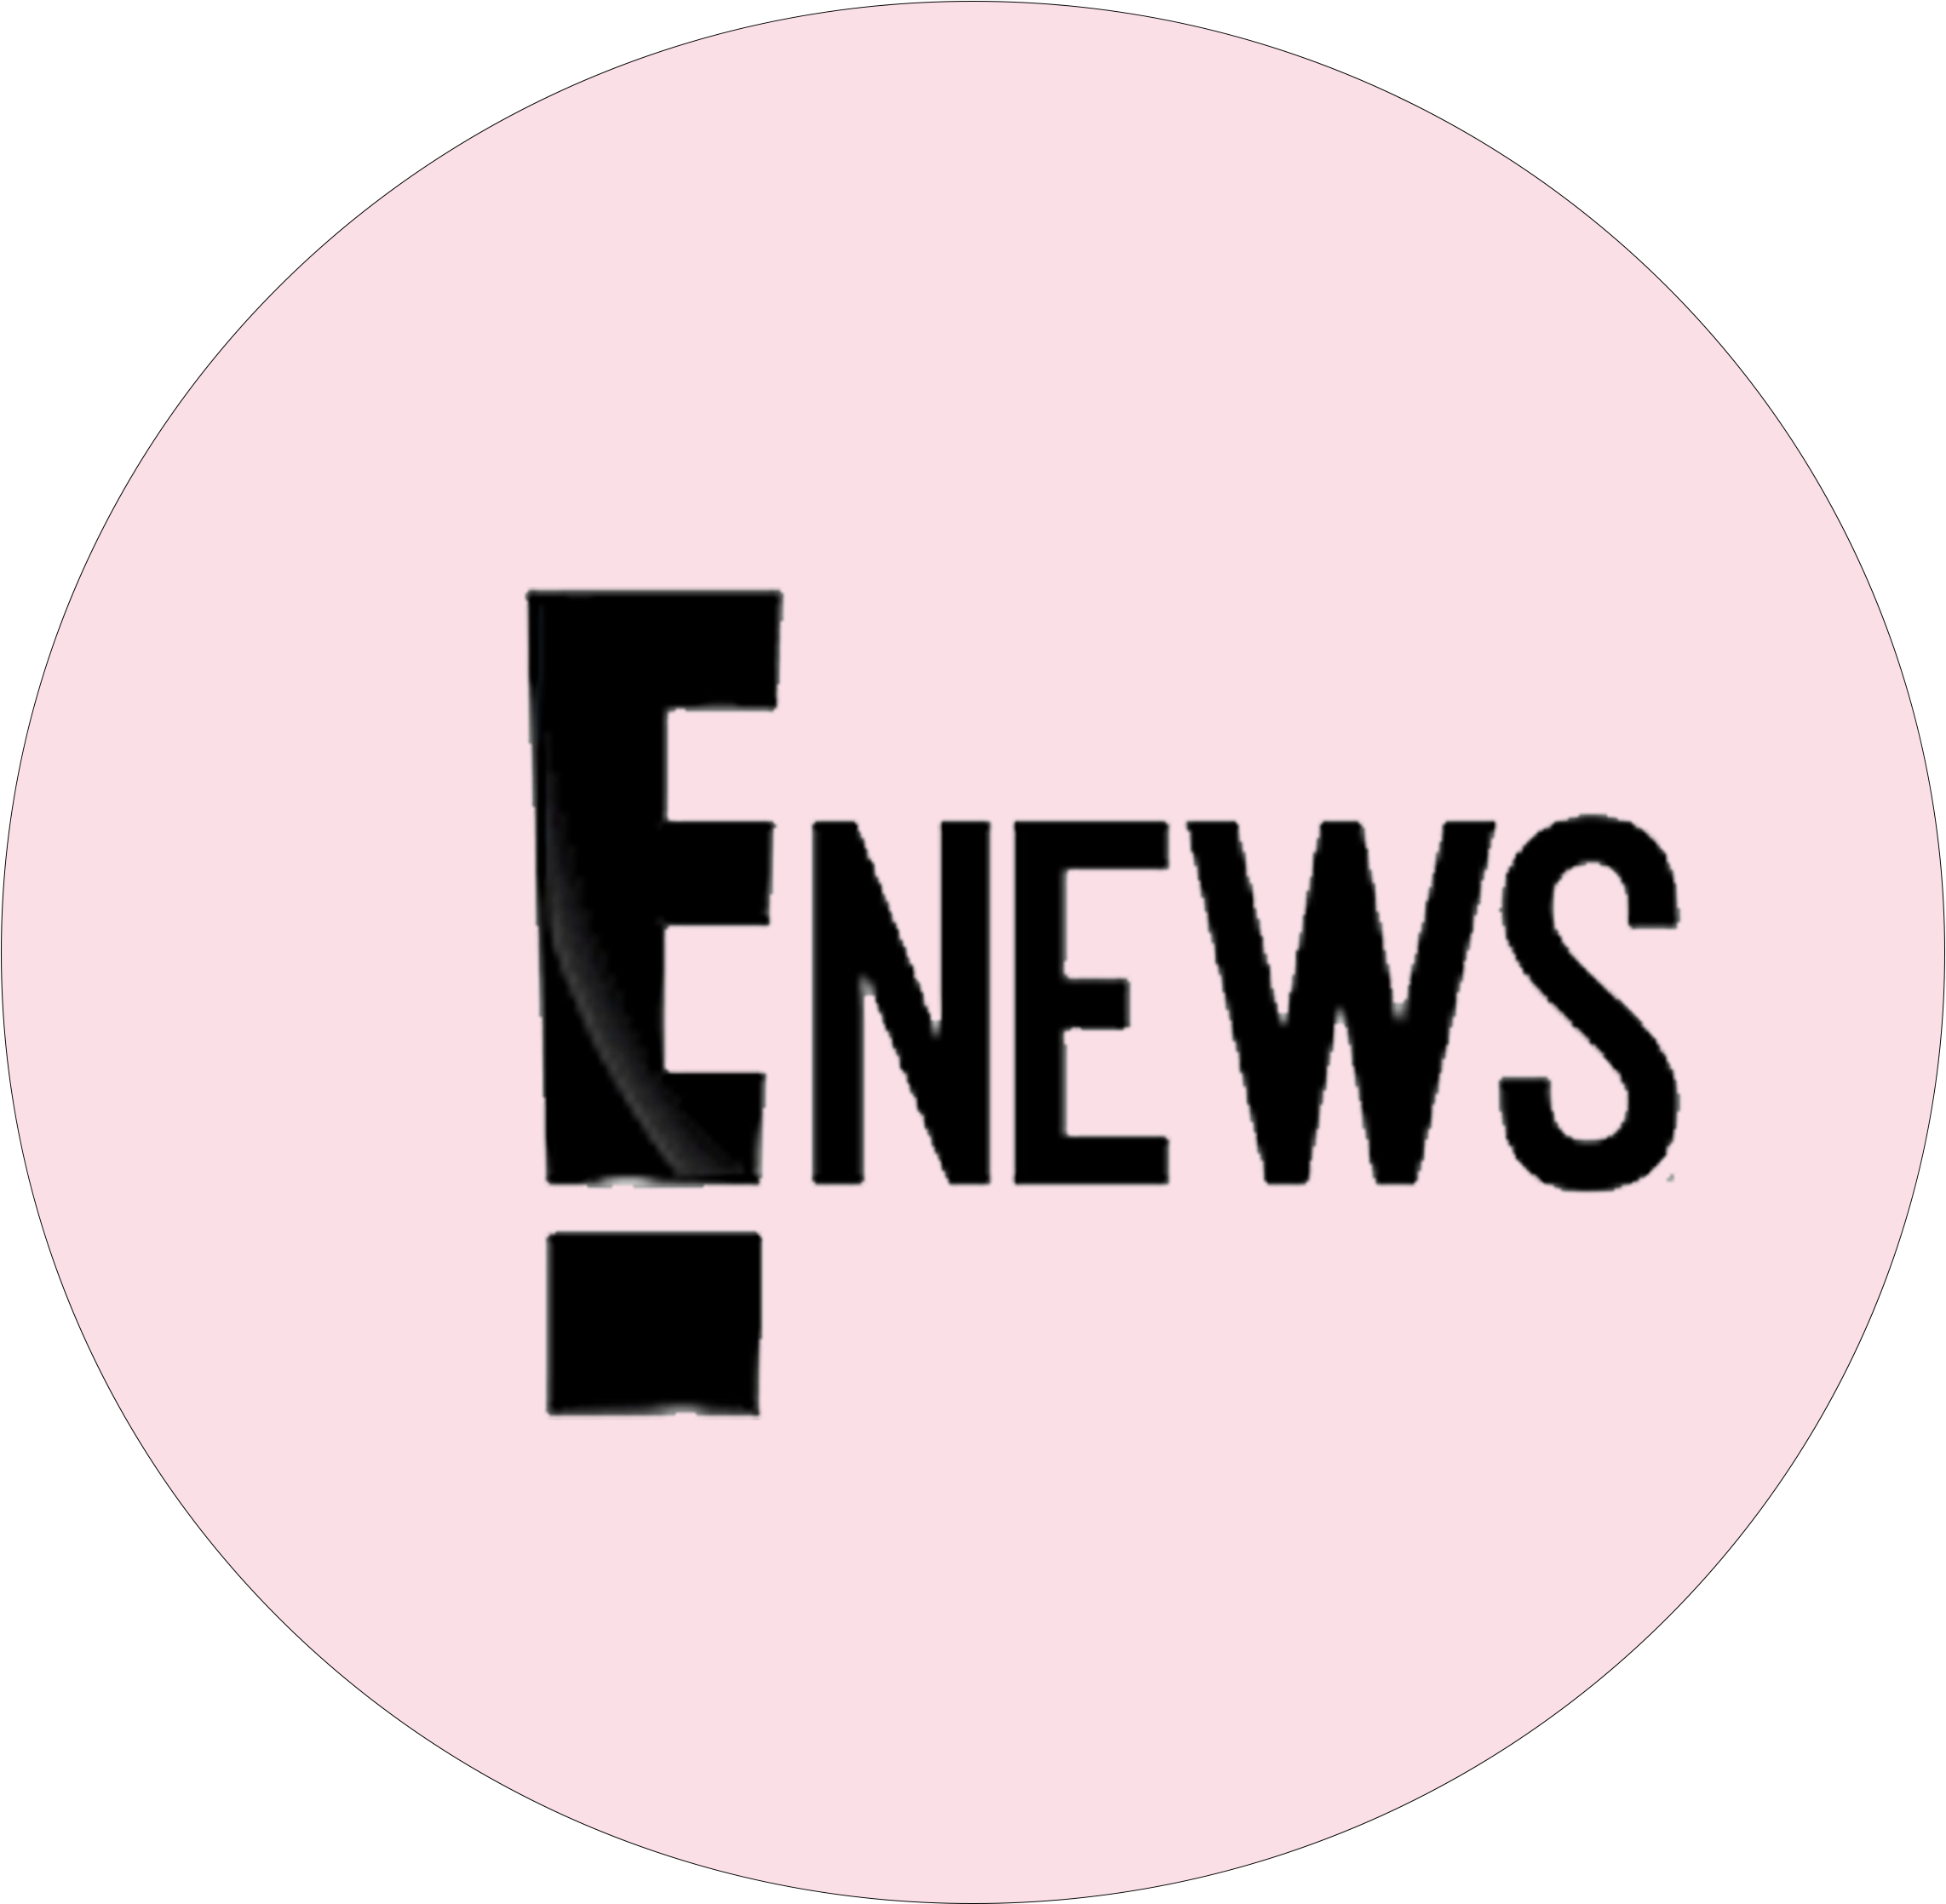 presswebsite